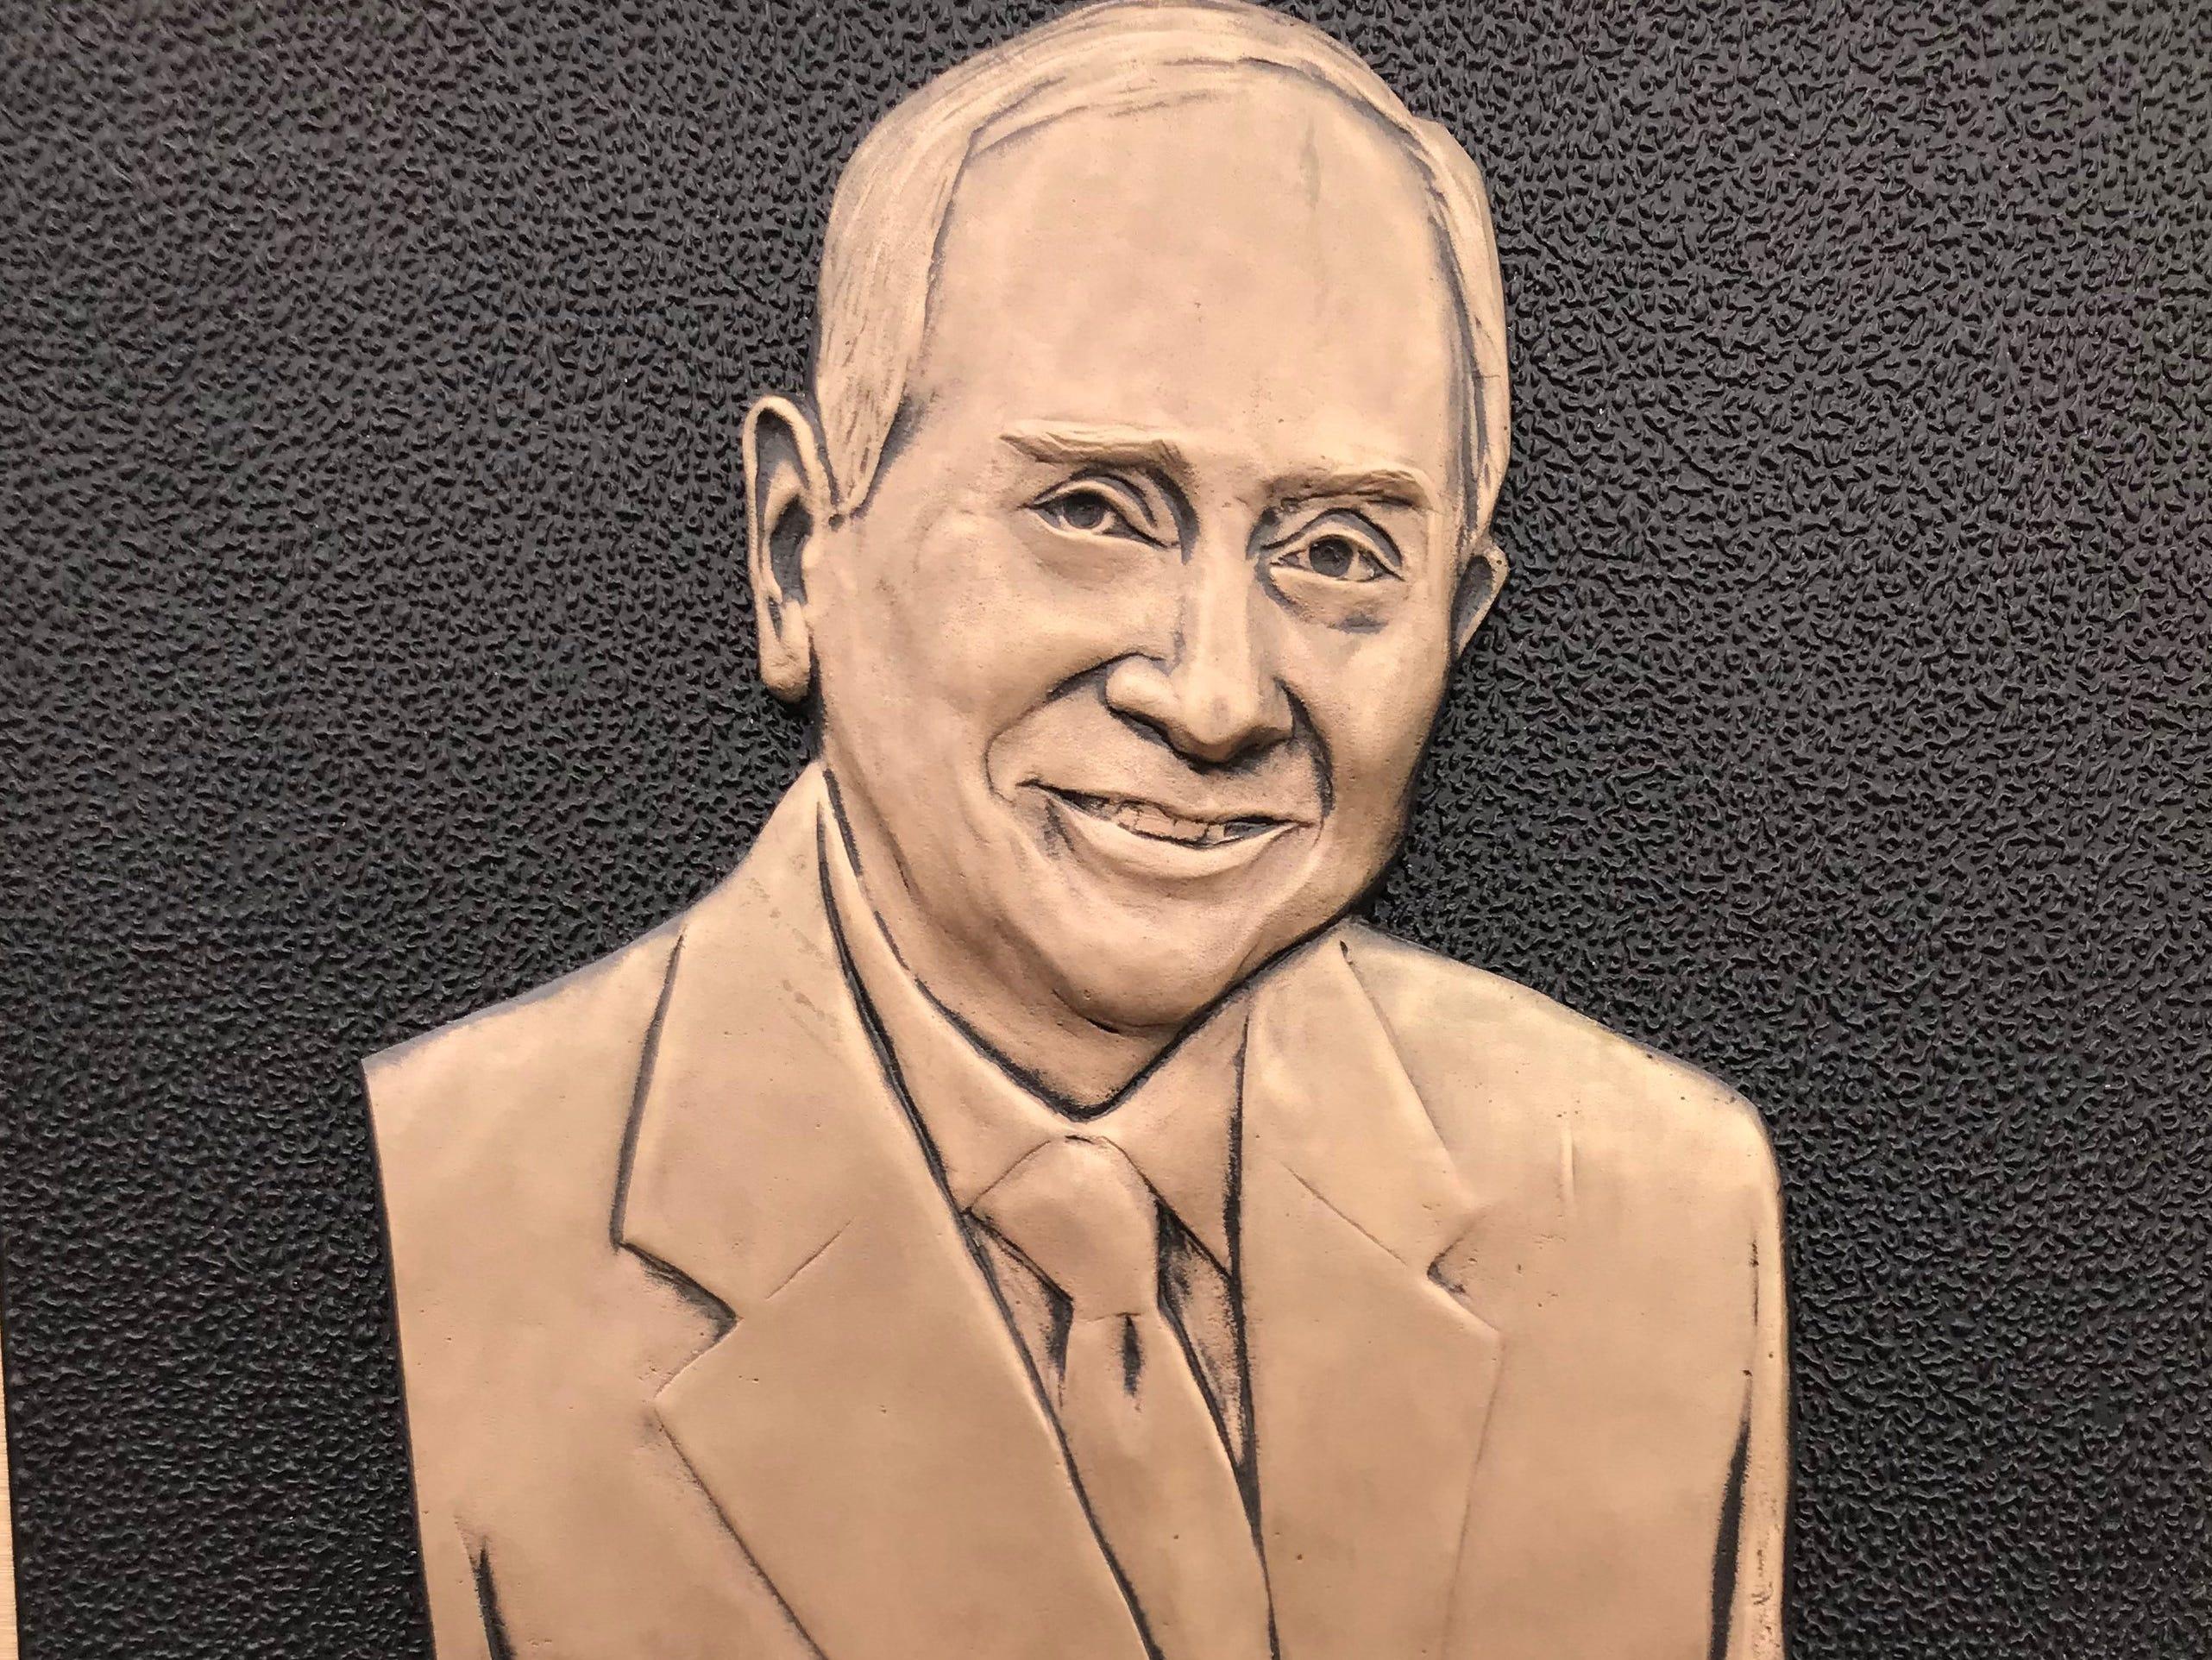 A hangar at Naval Air Station Kingsville was named after retired U.S. Navy Commander Everett Alvarez Jr. on Thursday, March 14, 2019.